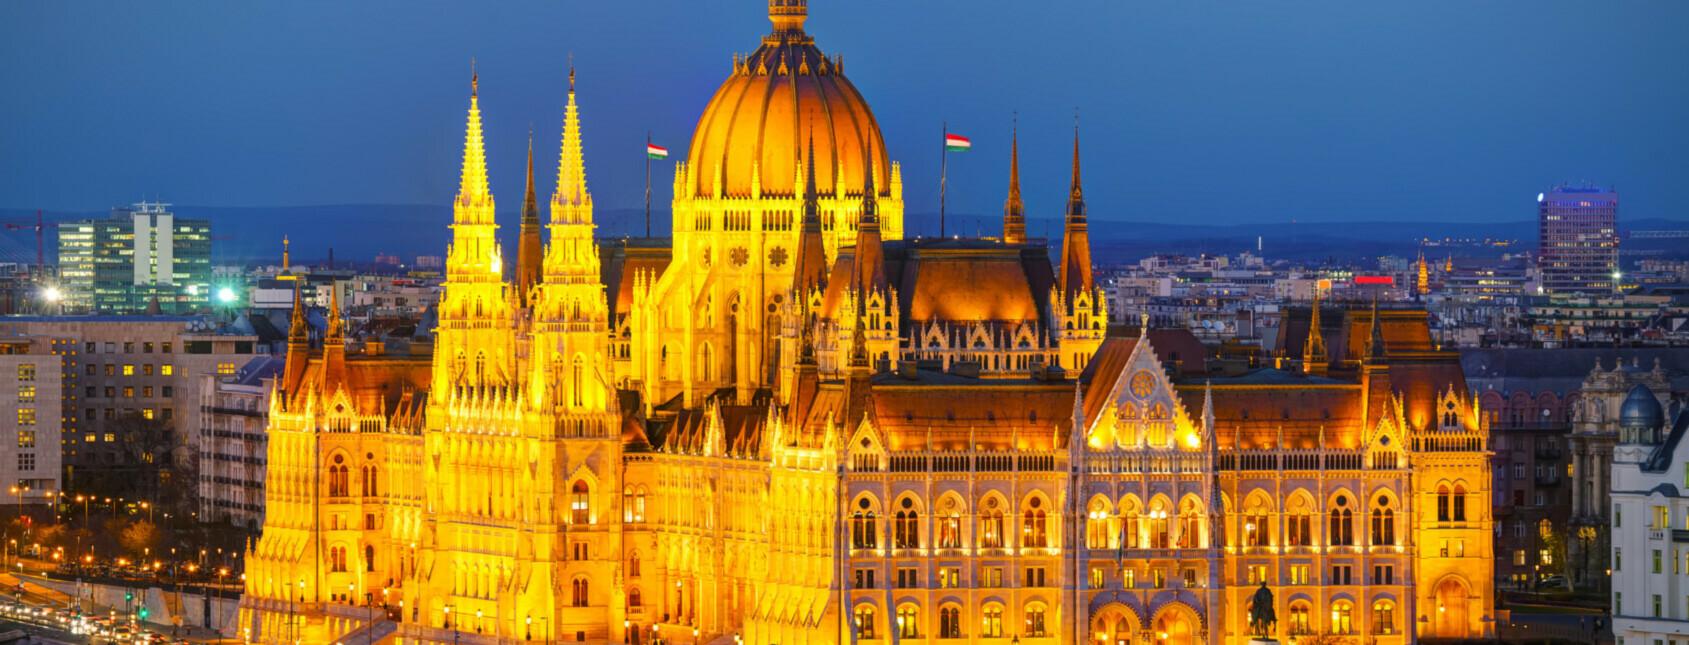 Salonzugfahrt Silvester in Budapest